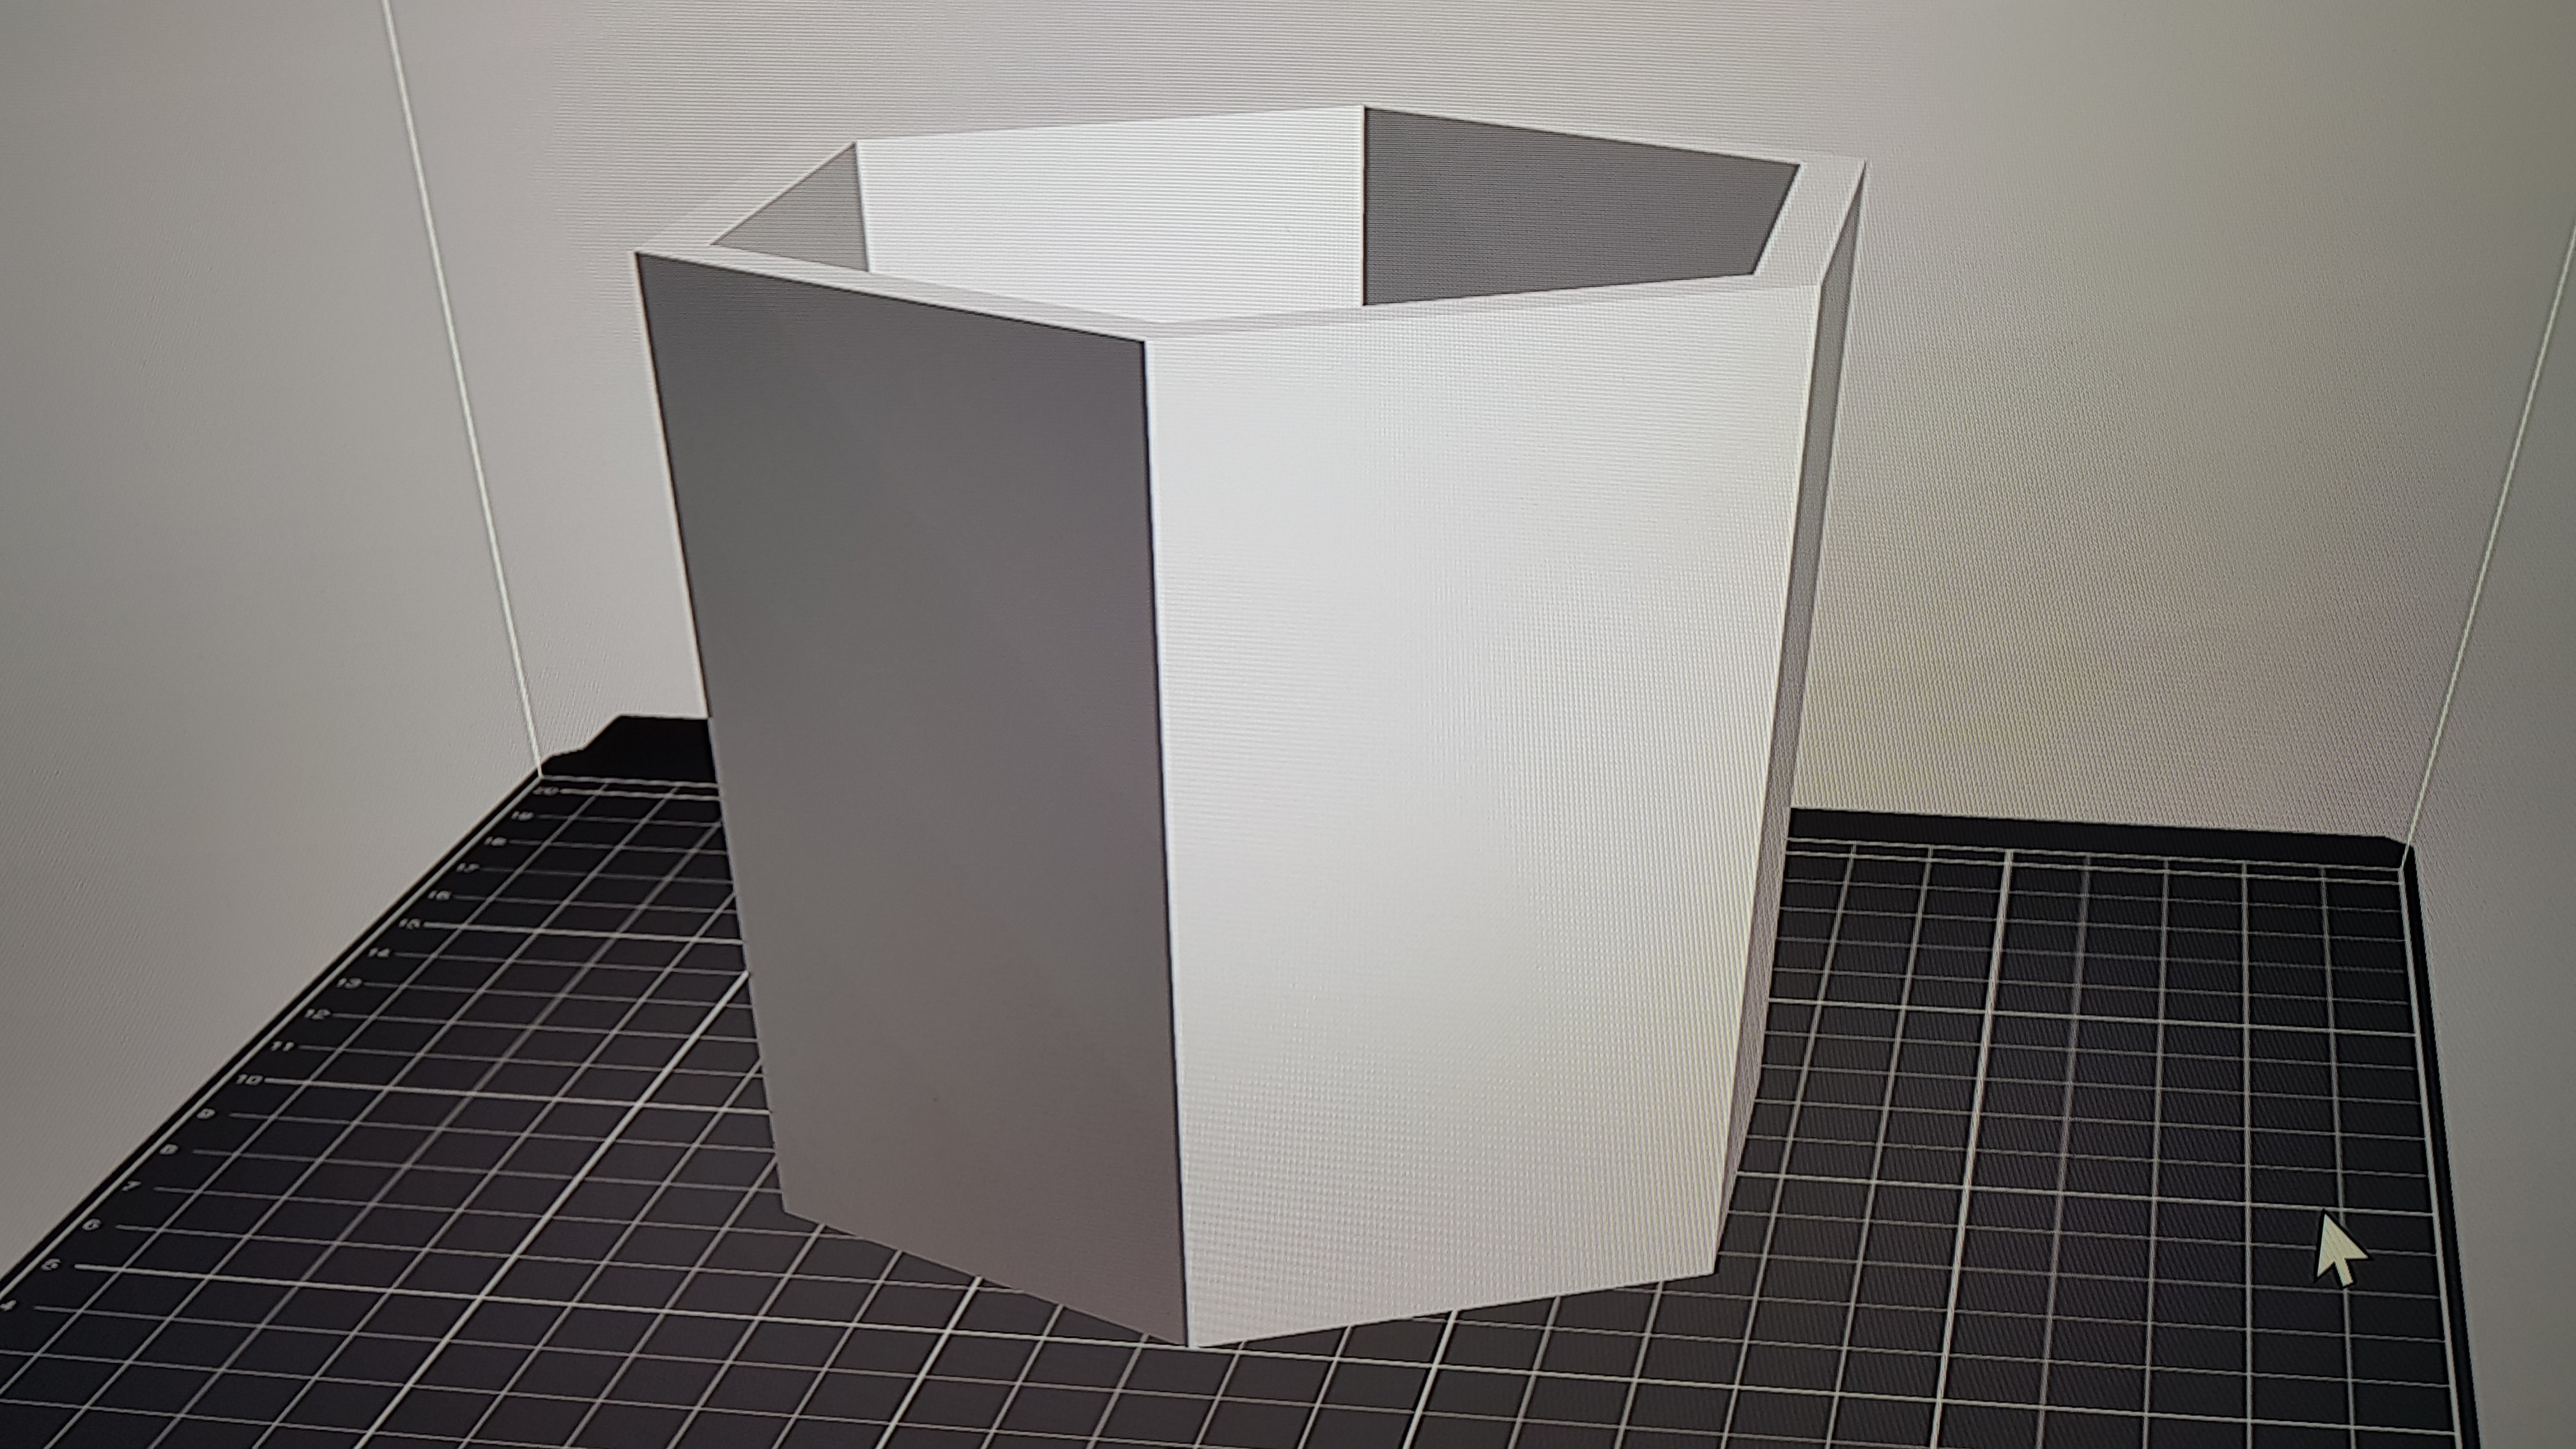 20180208_193430.jpg Download free STL file Hexagonal planter  • 3D printer model, solunkejagruti